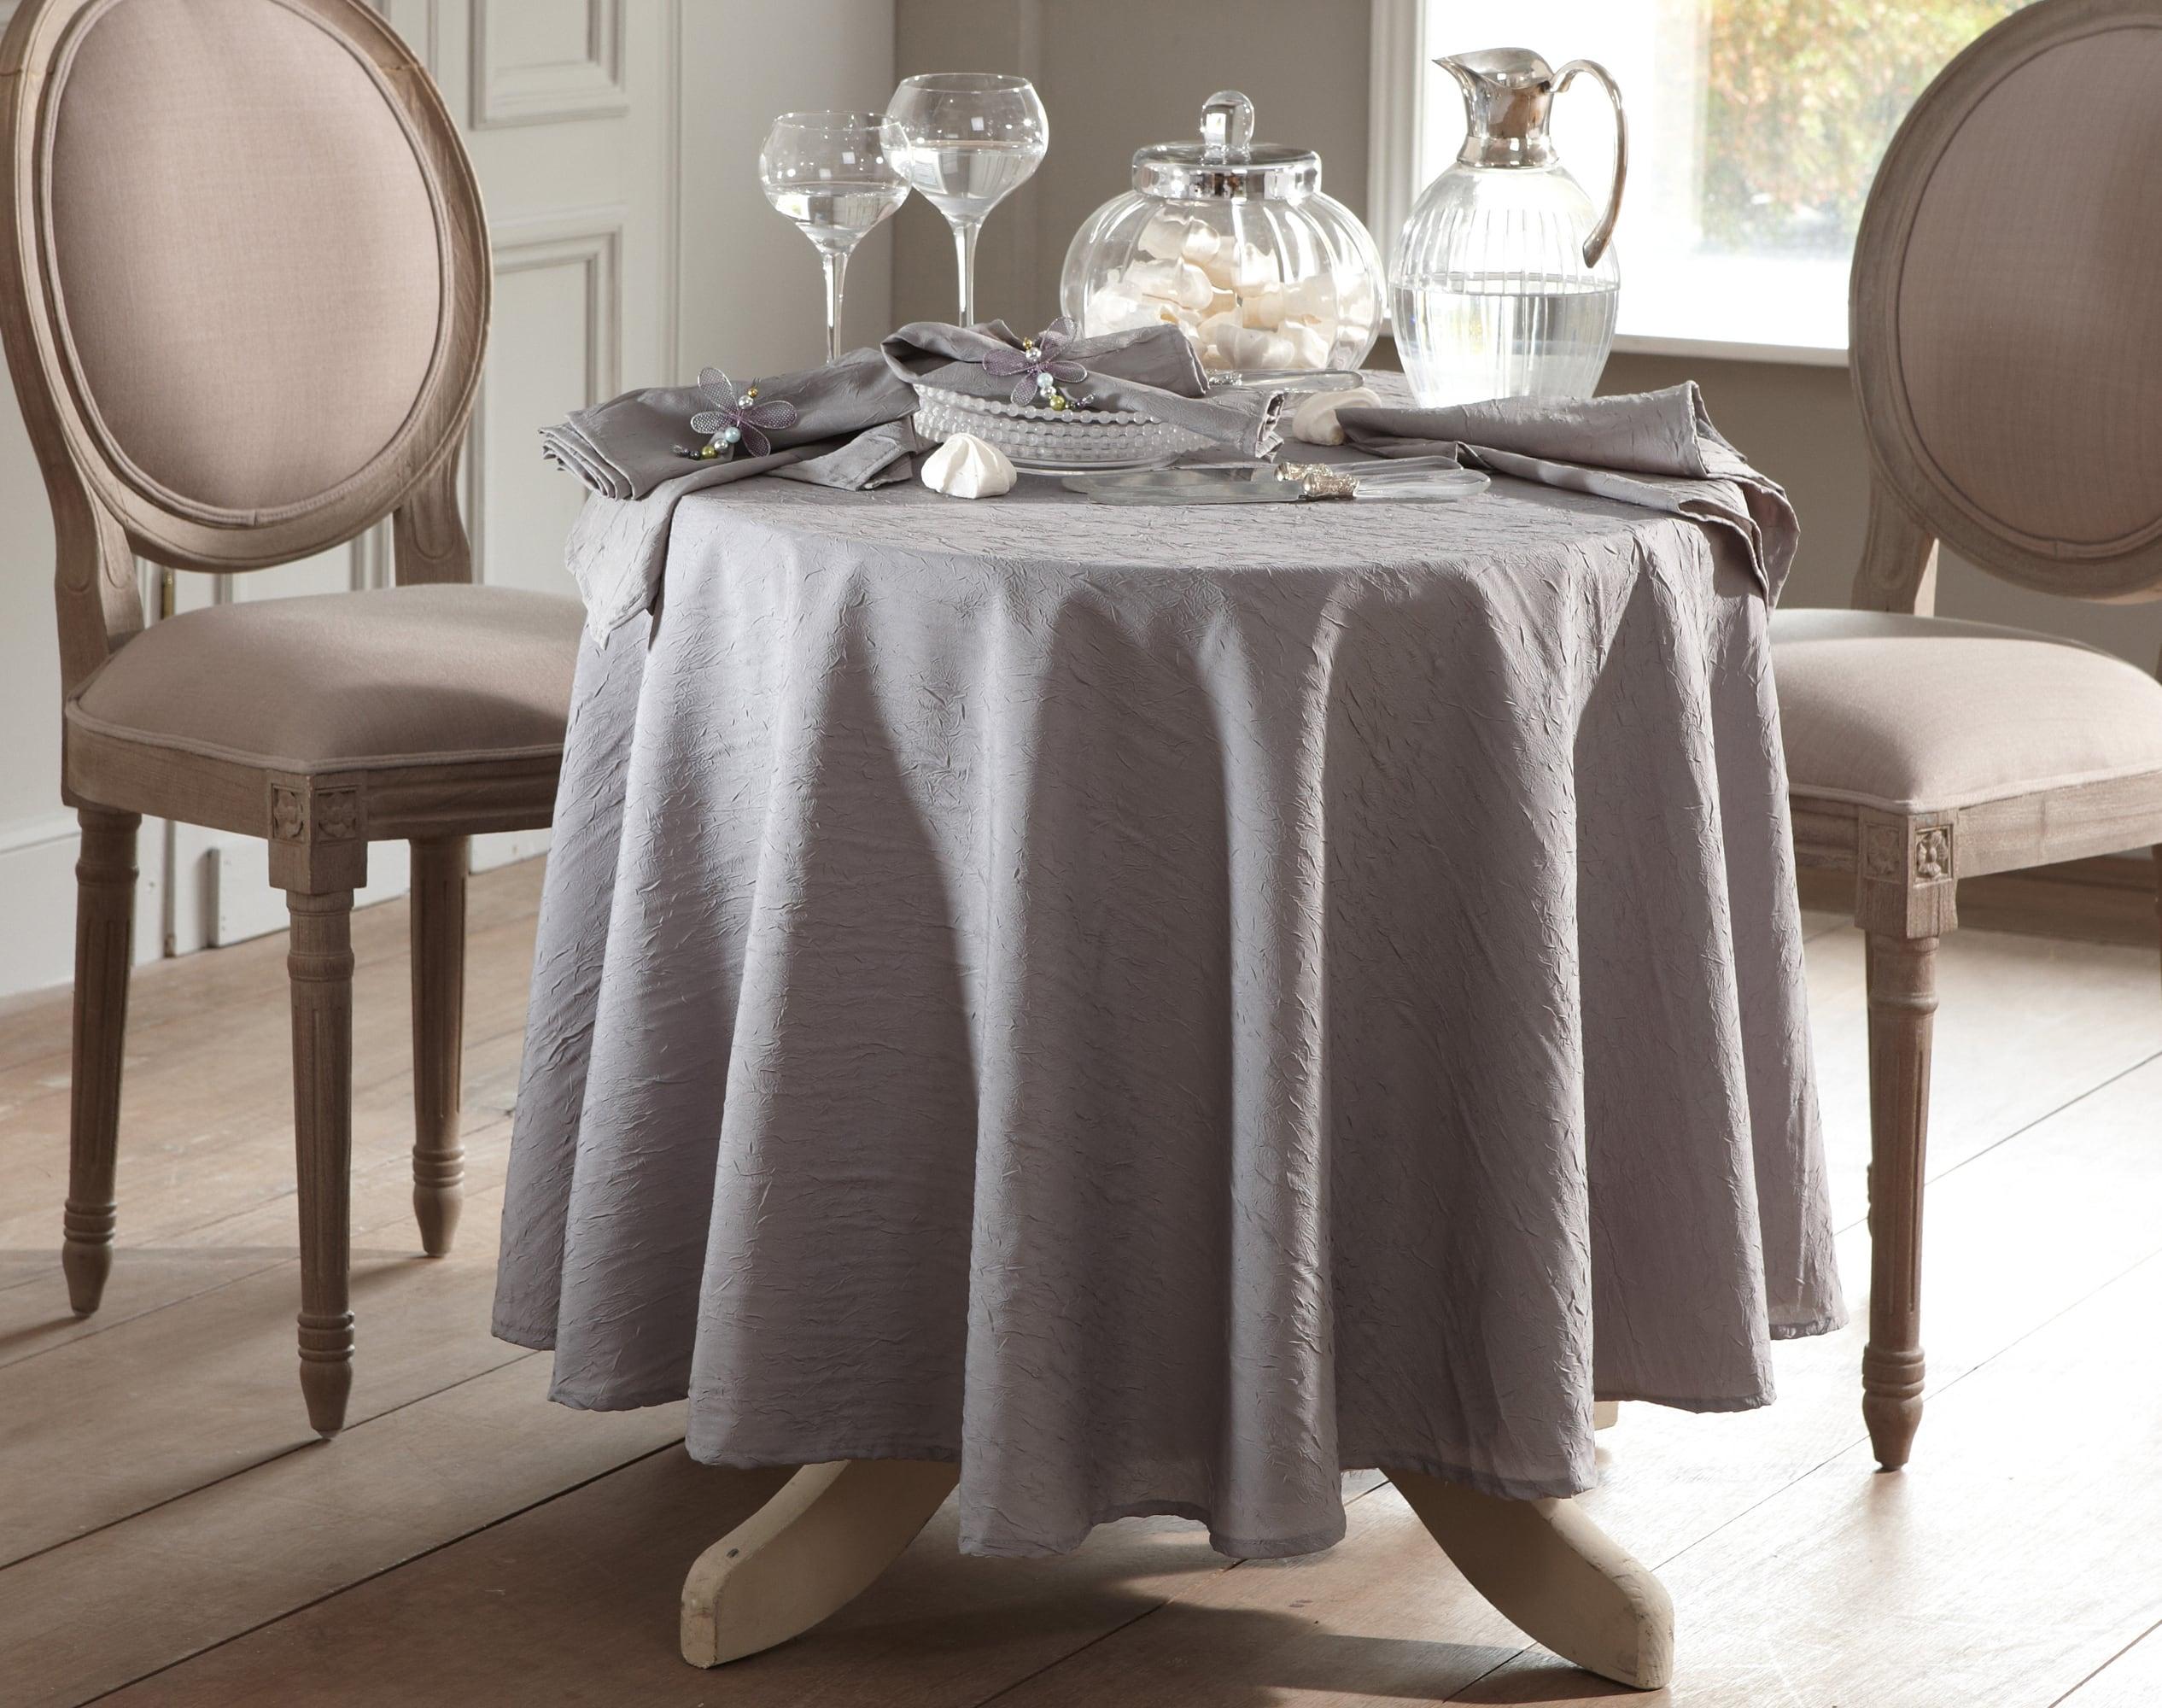 Nappe rectangulaire beige en polyester 150x300